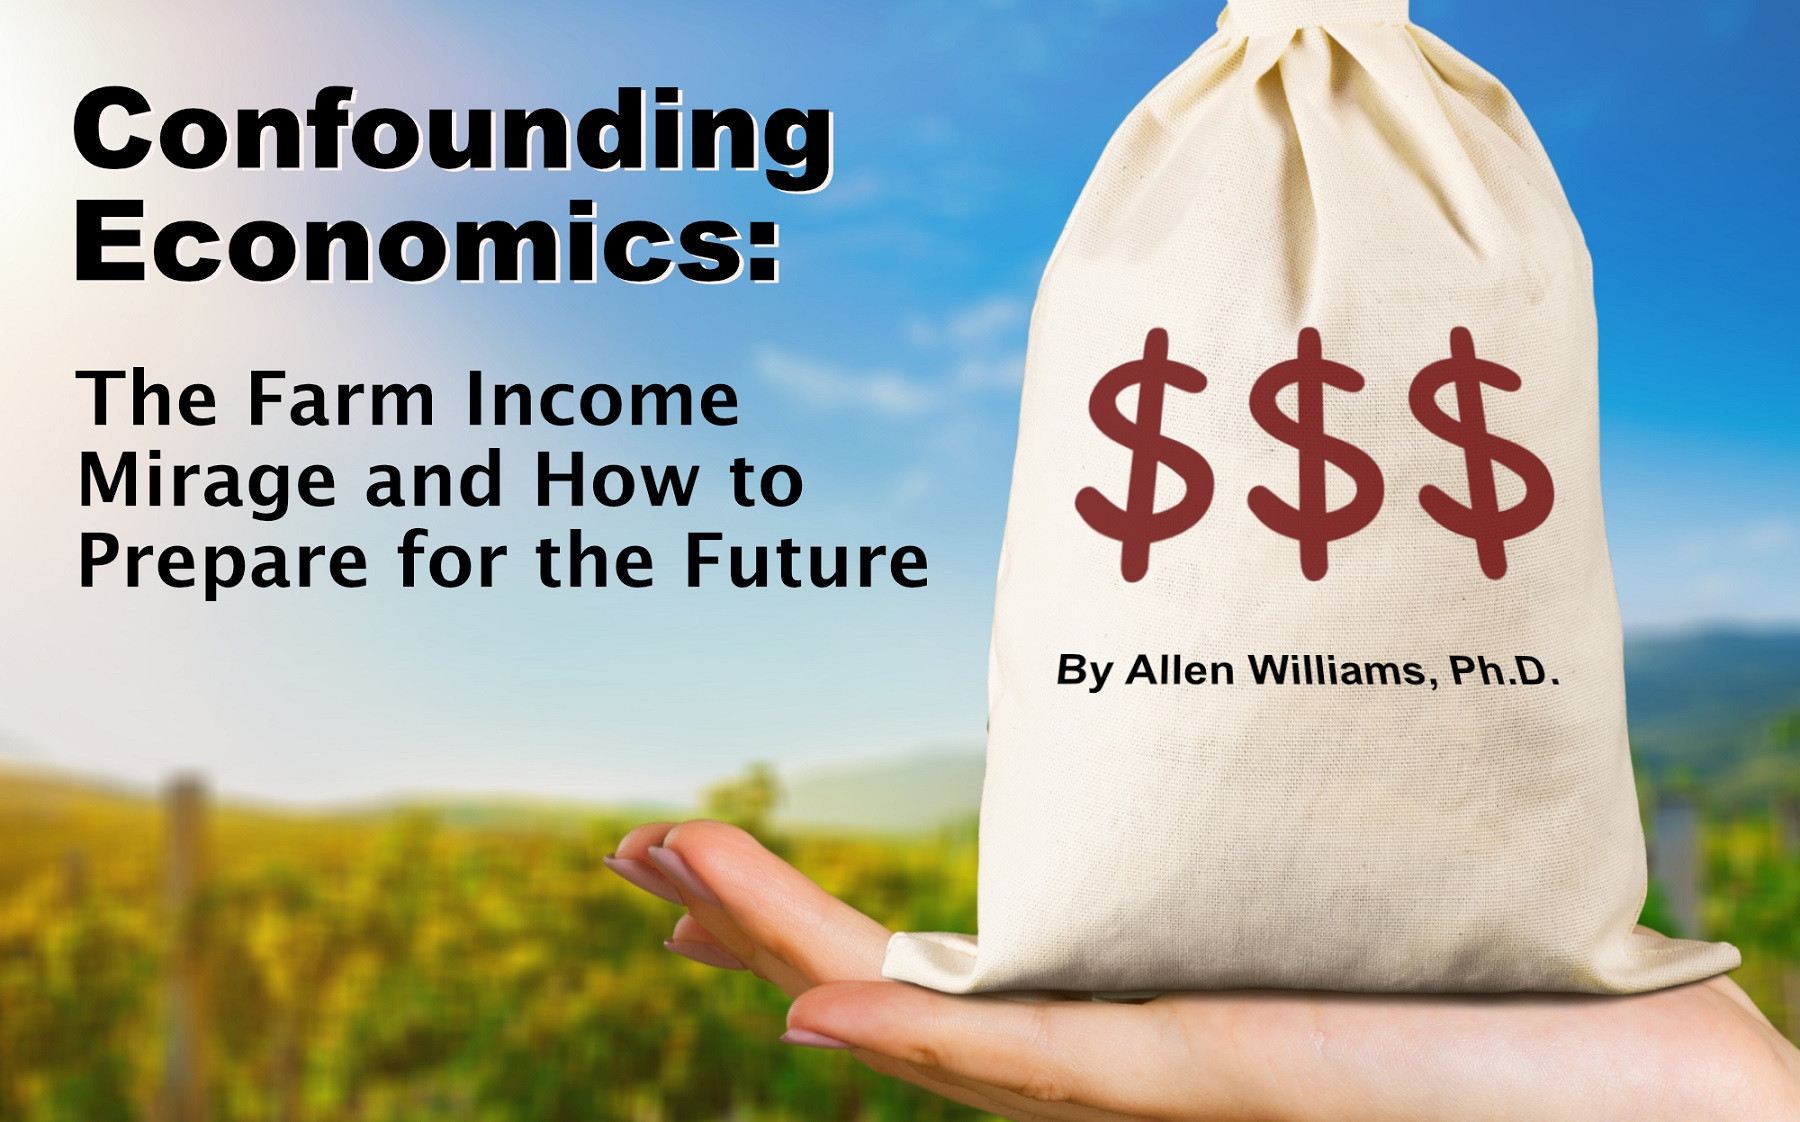 Confounding Economics: The Farm Income Mirage and How to Prepare for the Future